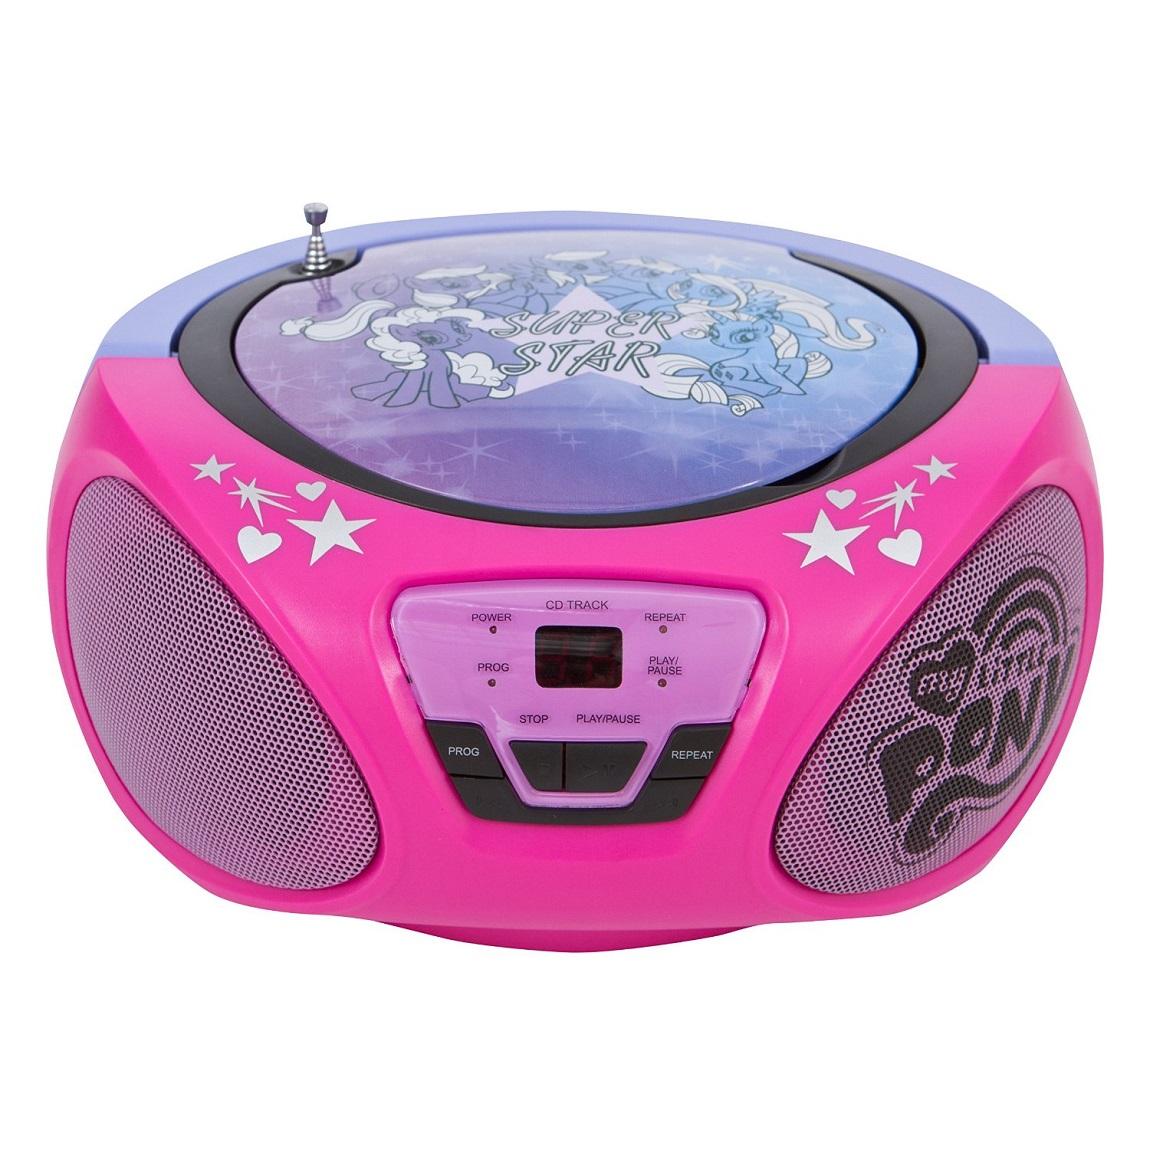 322629959046 besides Alatelektronik10 blogspot also Marine Am Fm Radios together with 172056803764 likewise China Portable CD Radio Player W CD008. on portable cd player with fm